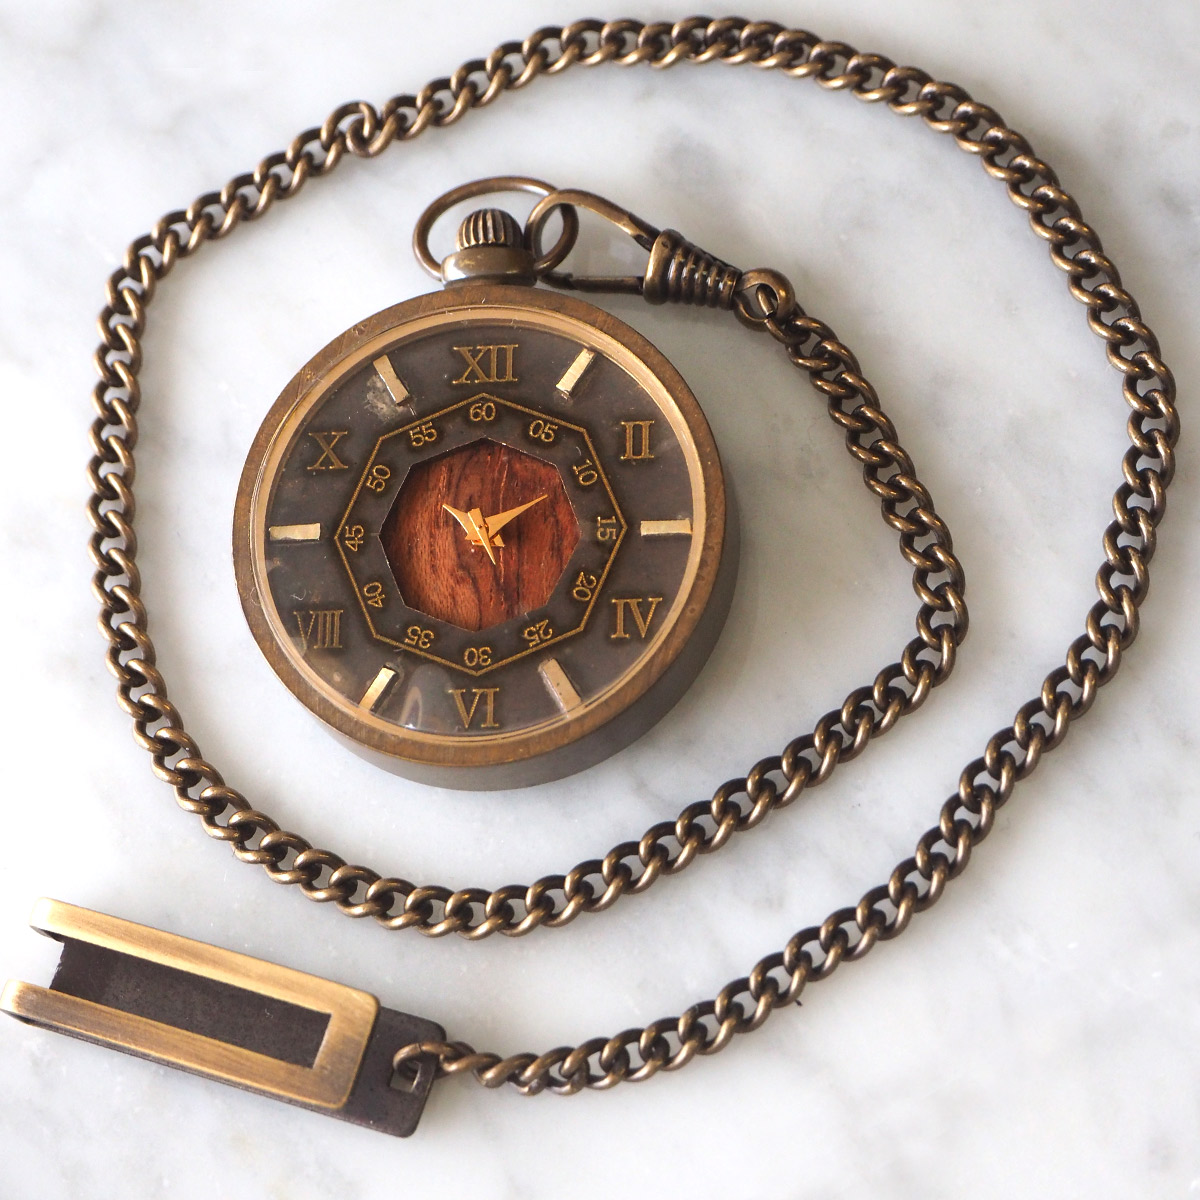 Domestic production made in vie (Vee) vie (Vee) handicraft watch